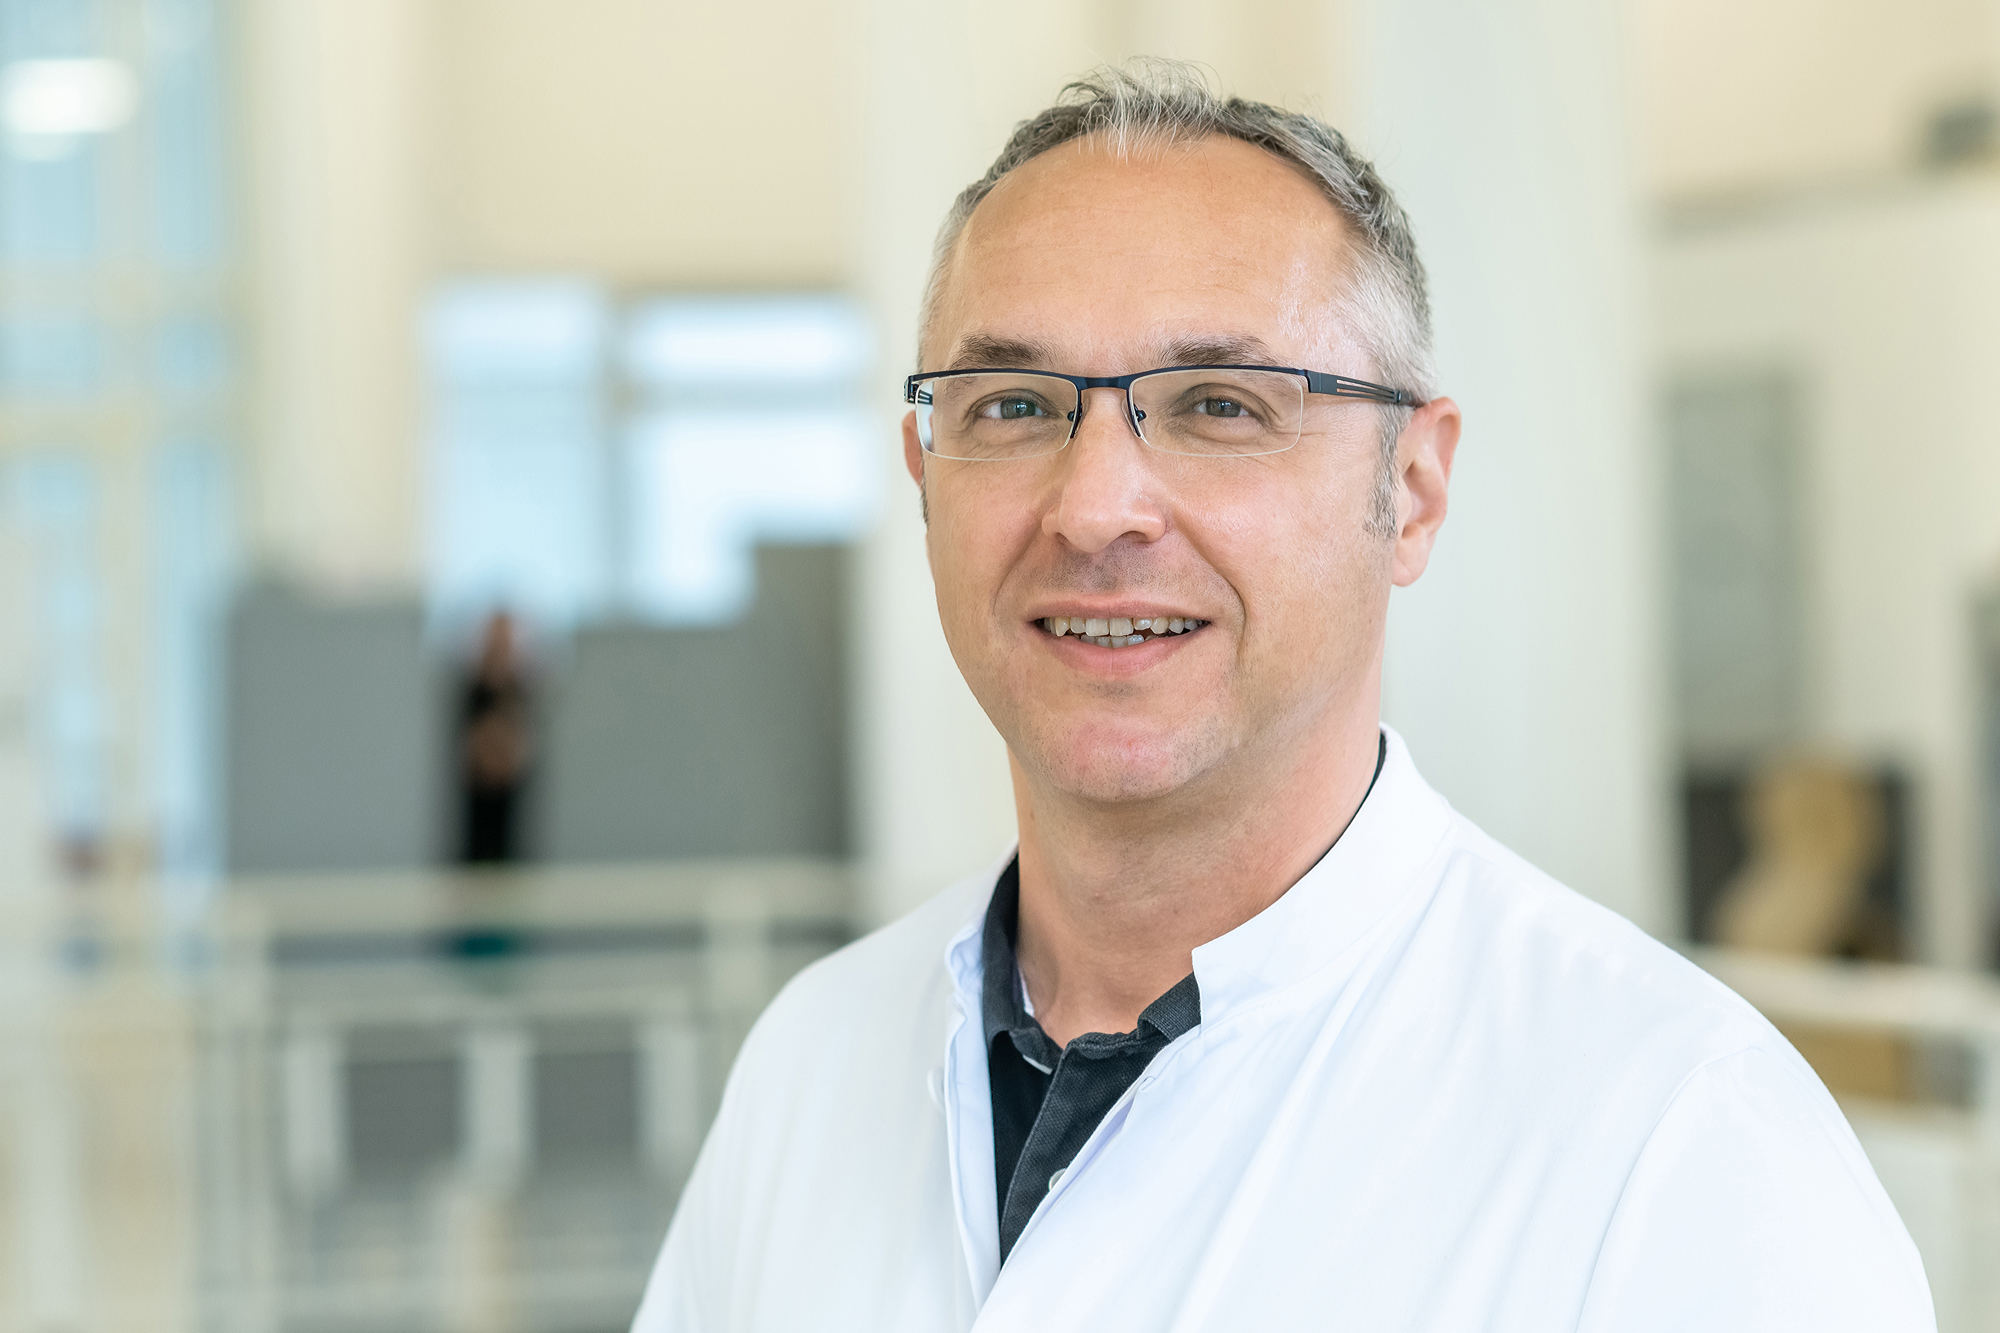 PD Dr. med. Markus Ditschkowski